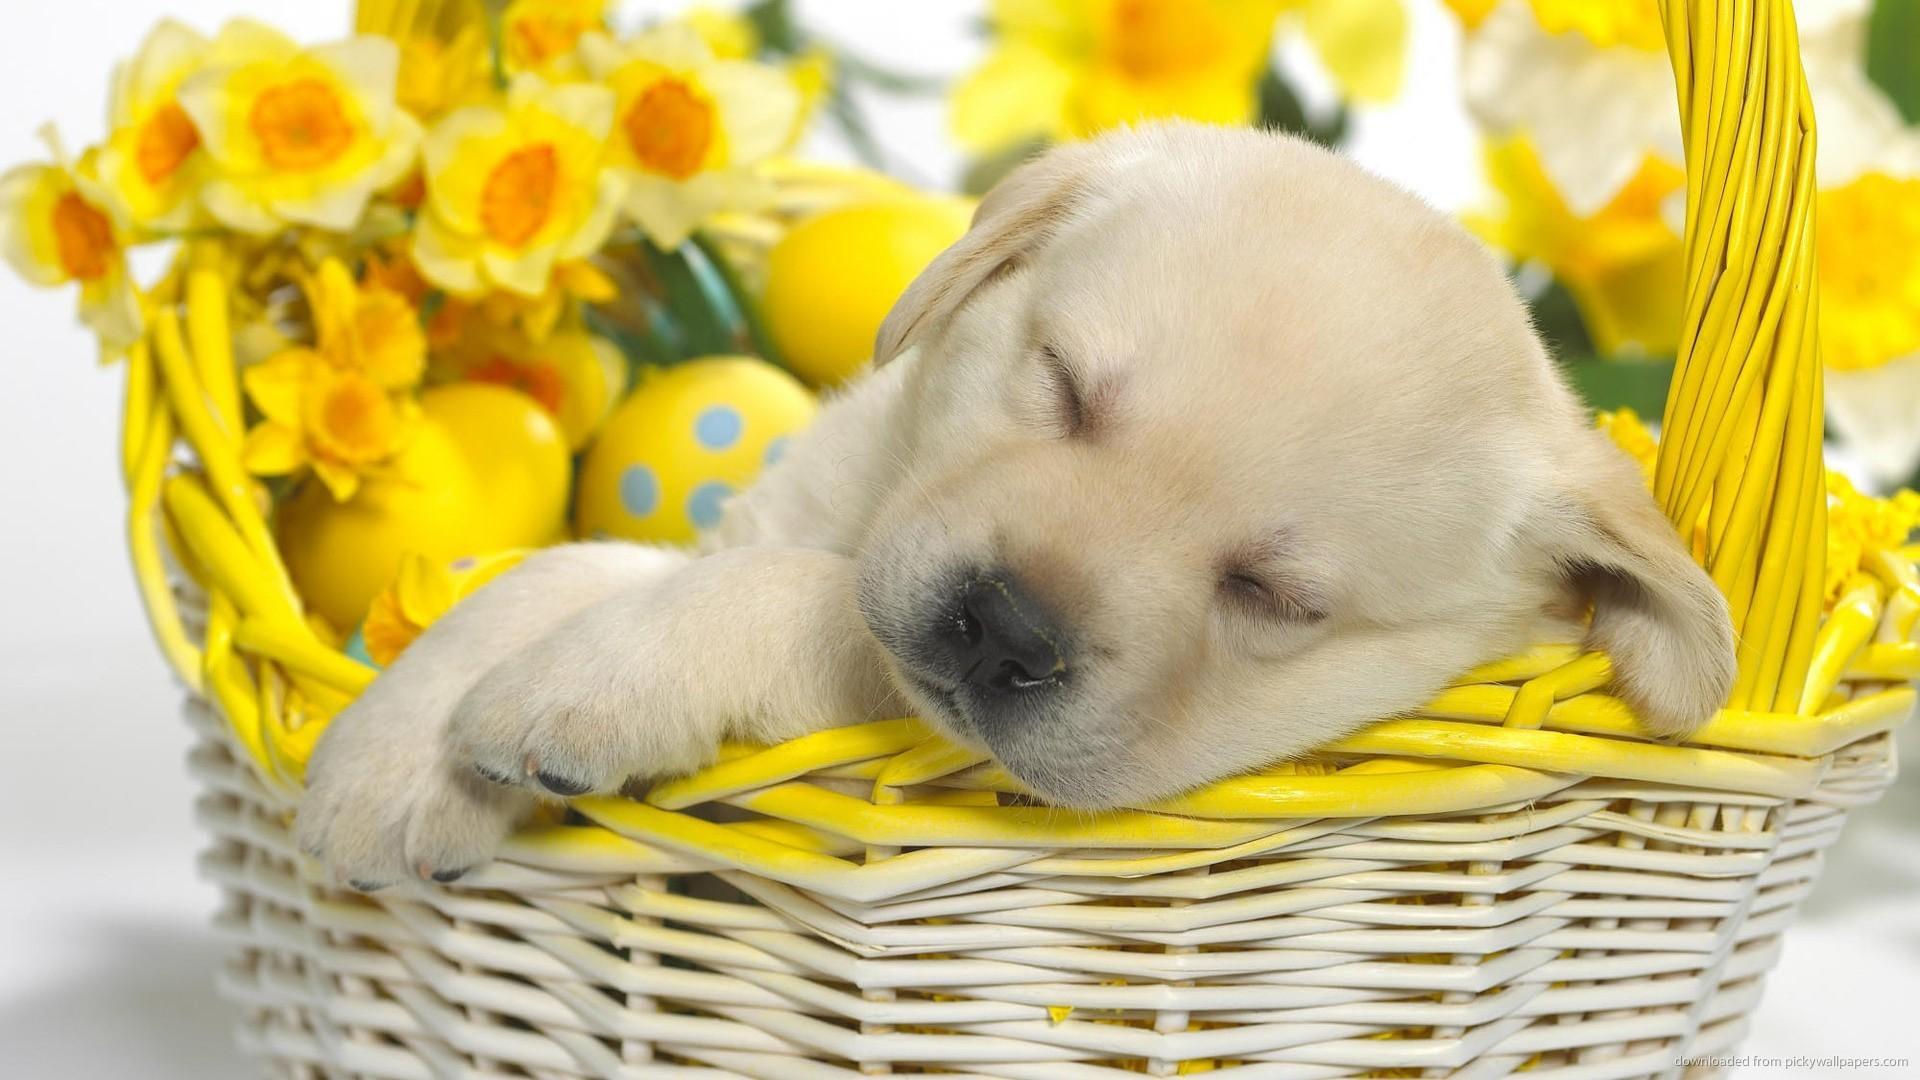 Download 1920x1080 Cute Puppy Sleeping In An Easter Basket Wallpaper 1920x1080